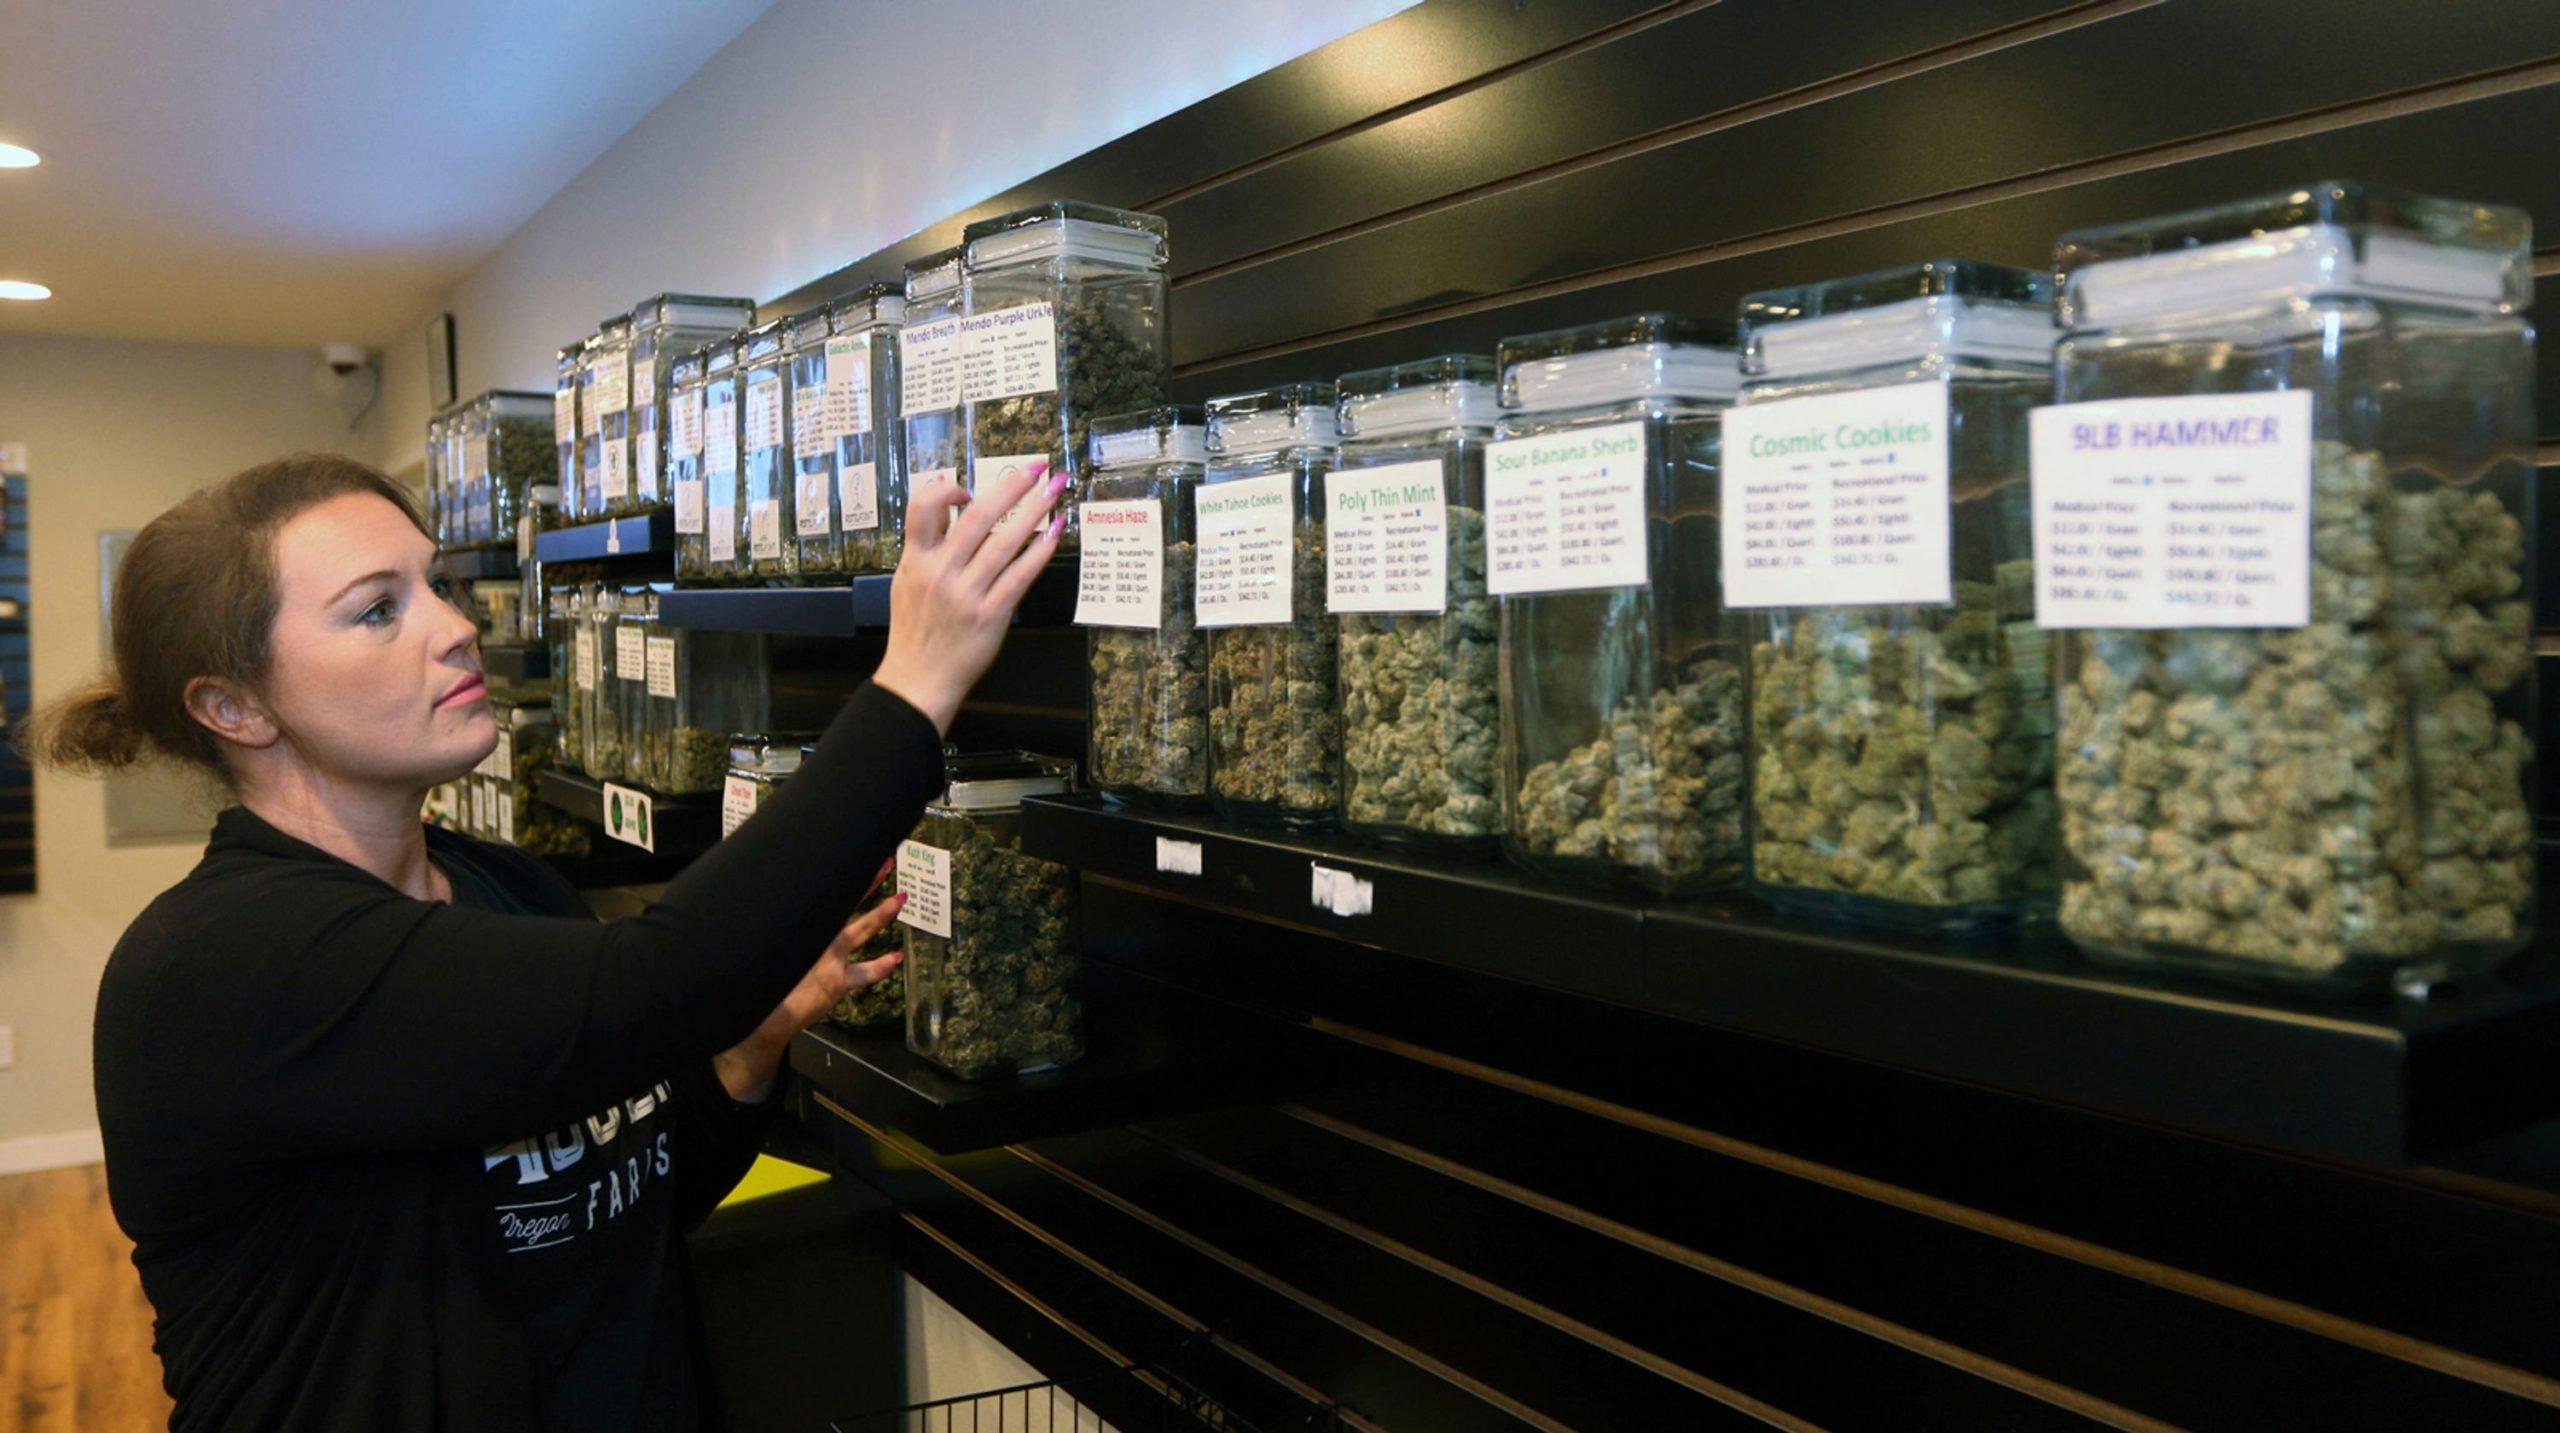 Wisconsin marijuana laws: Change will be slow, despite win at polls